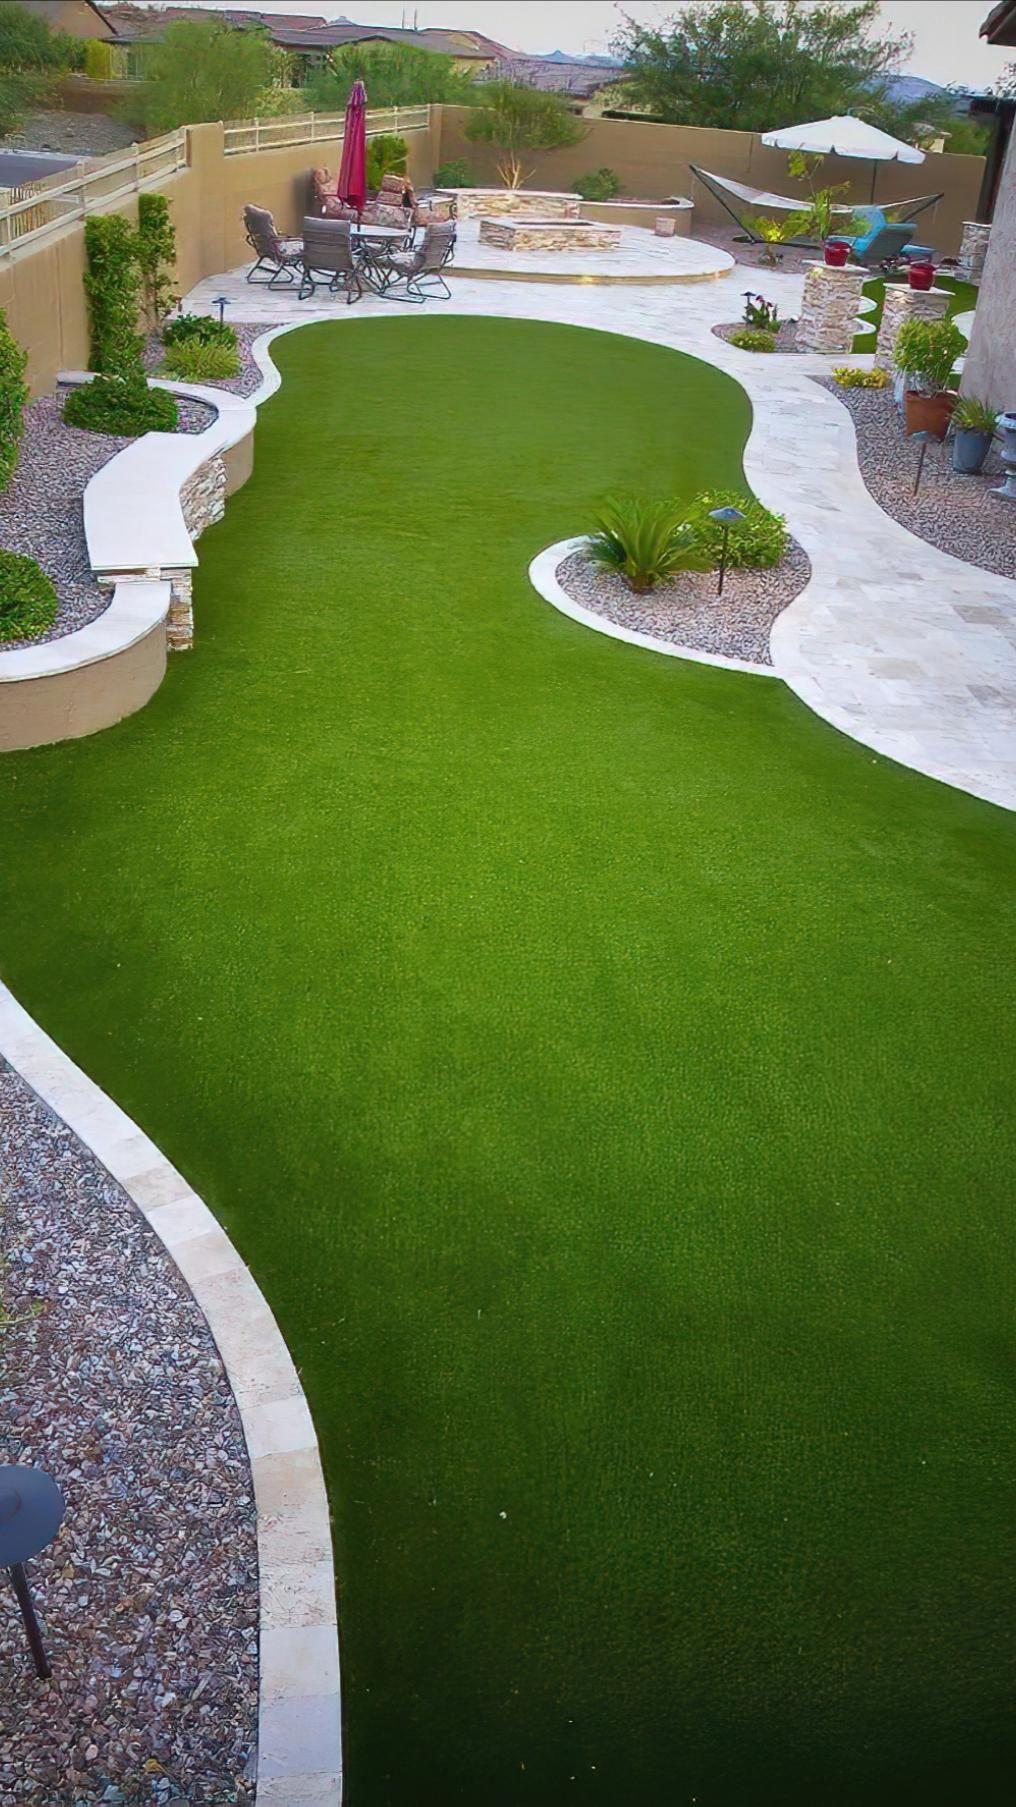 Amazing Garden Lawn Pinterest Backyard landscaping ideas with turf